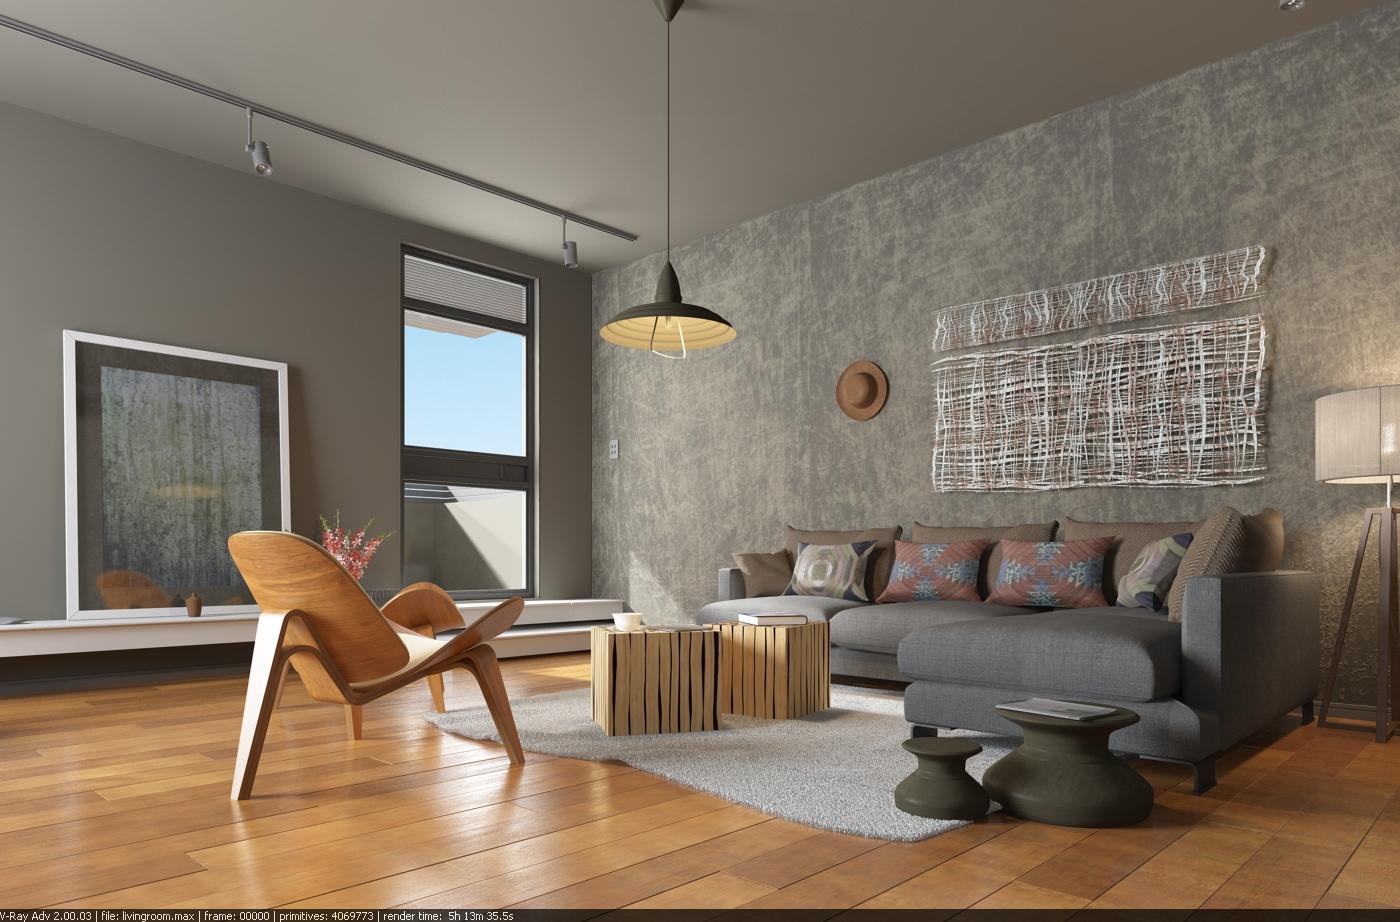 Living Room | Interior Rendering on Behance